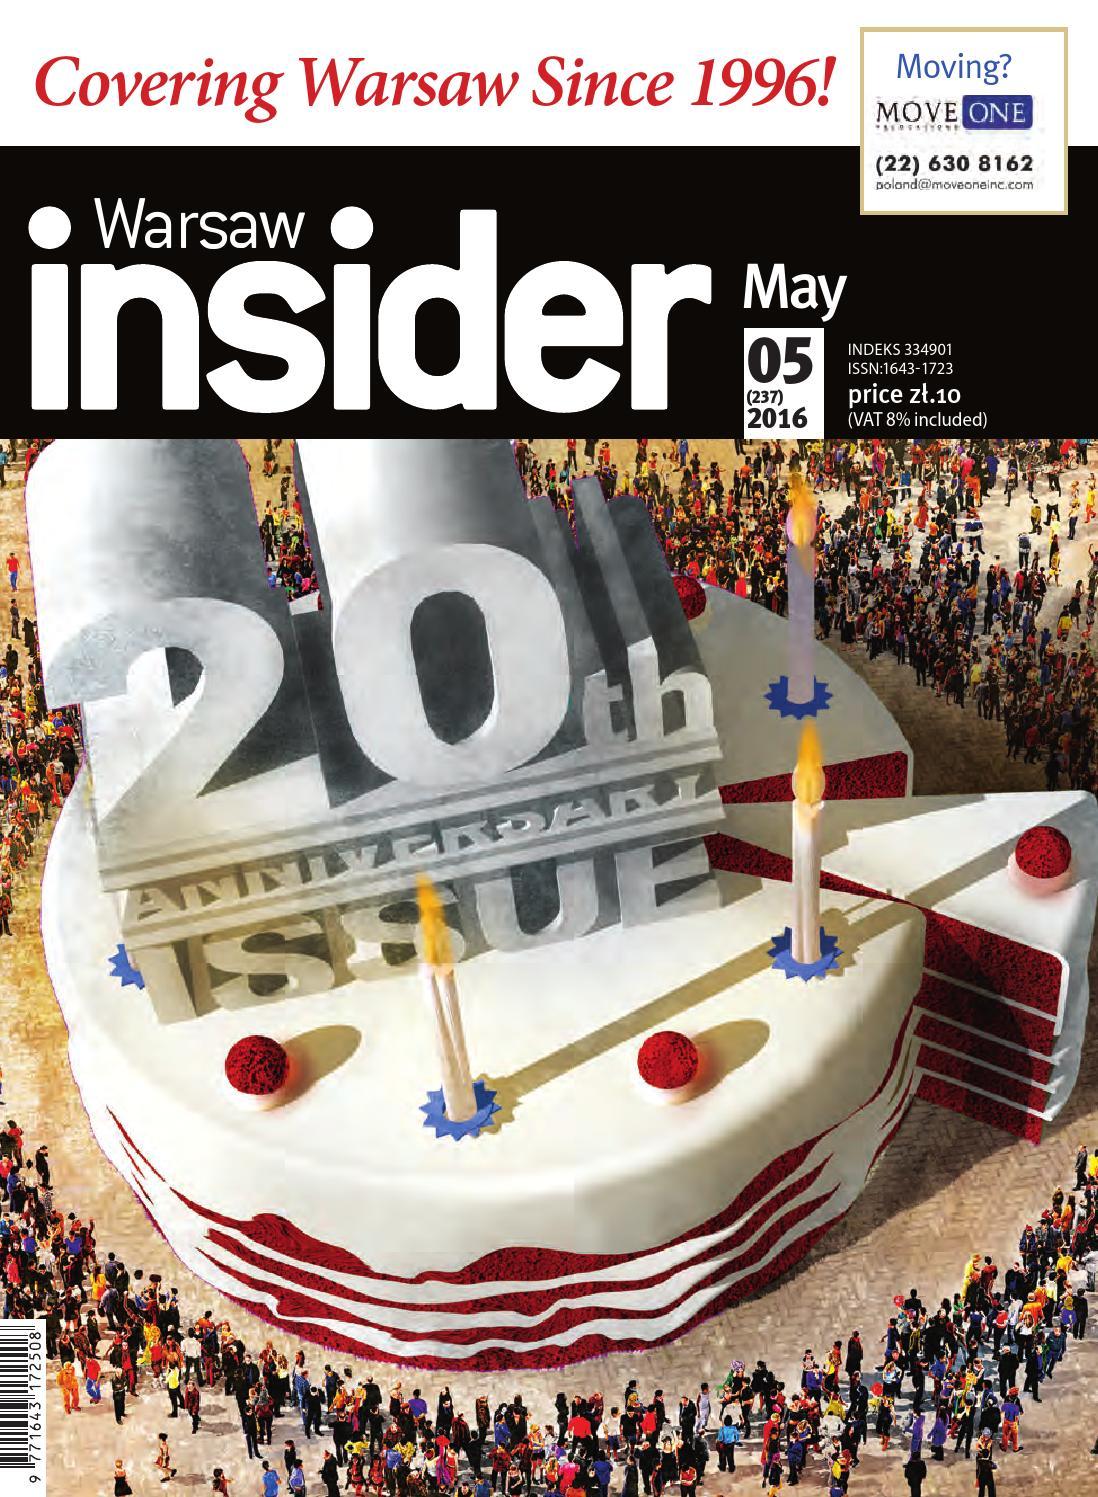 Warsaw Insider May 2016 237 By Valkea Media Pro Issuu